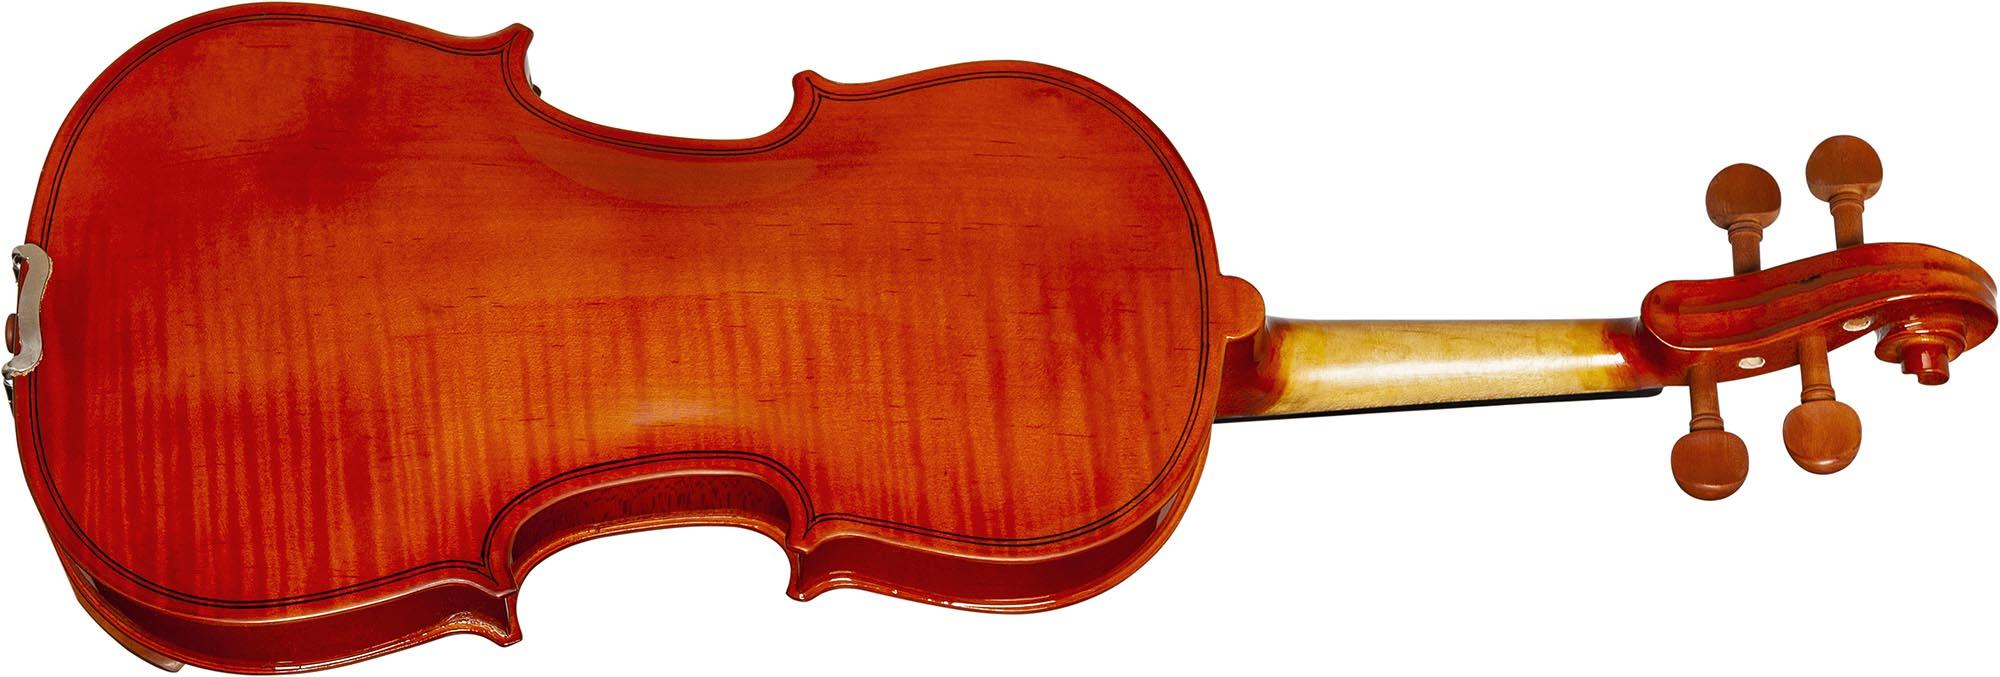 hve241 violino hofma hve241 visao posterior